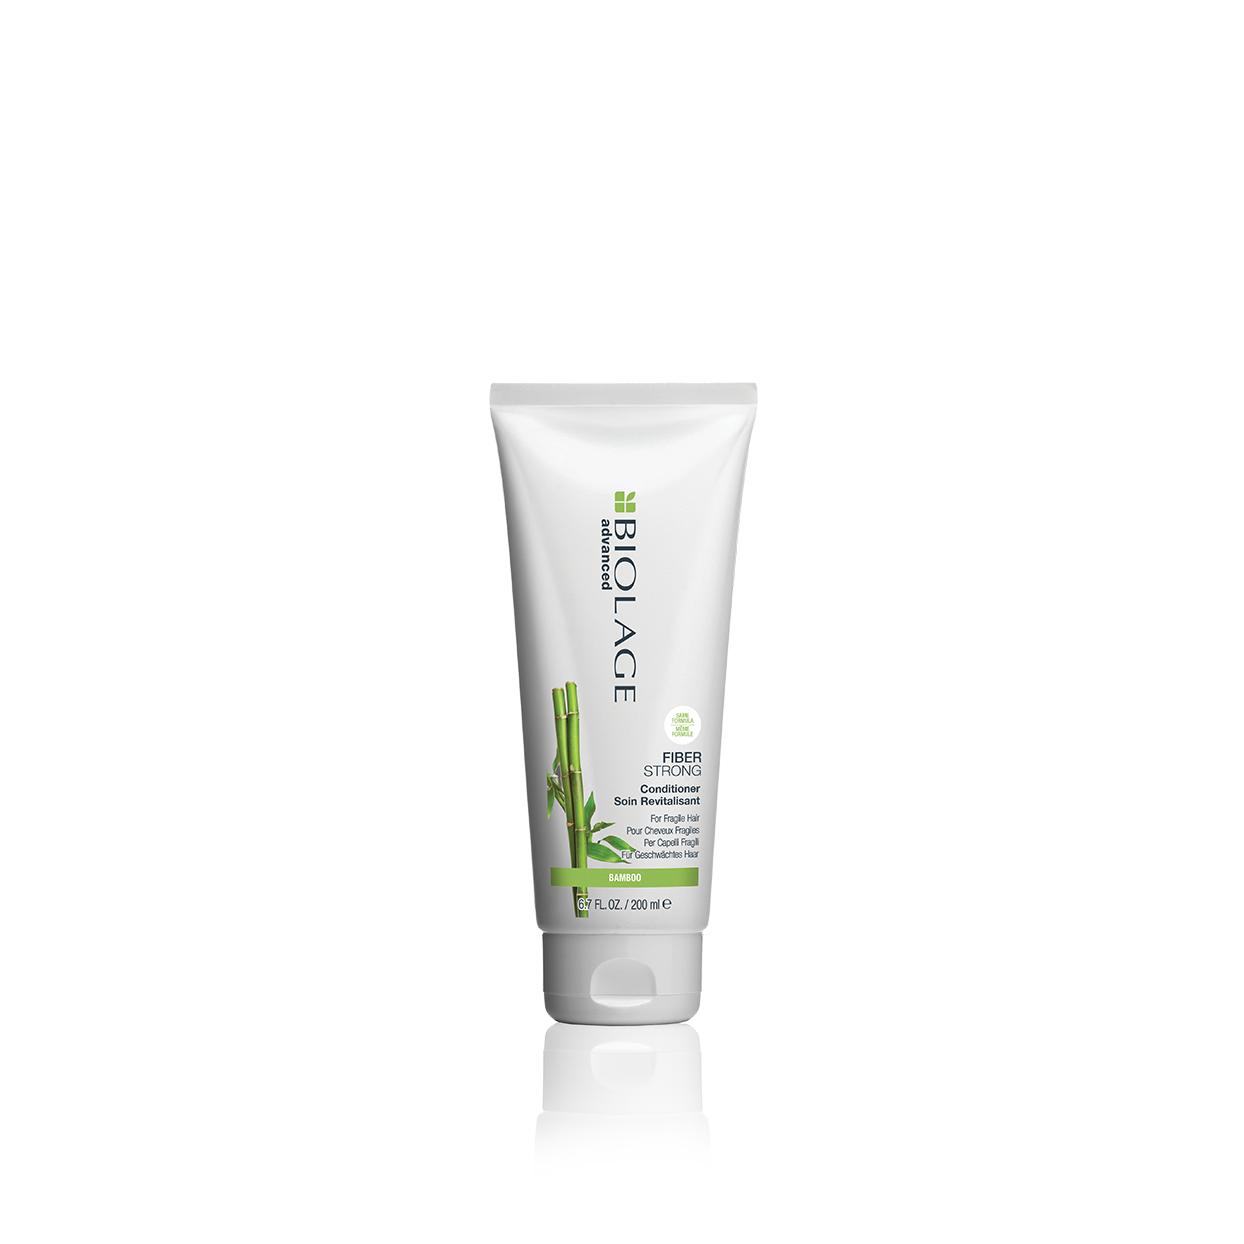 Biolage Advanced FiberStrong Fragile Hair Conditioner Strengthening Conditioner for Fragile Hair